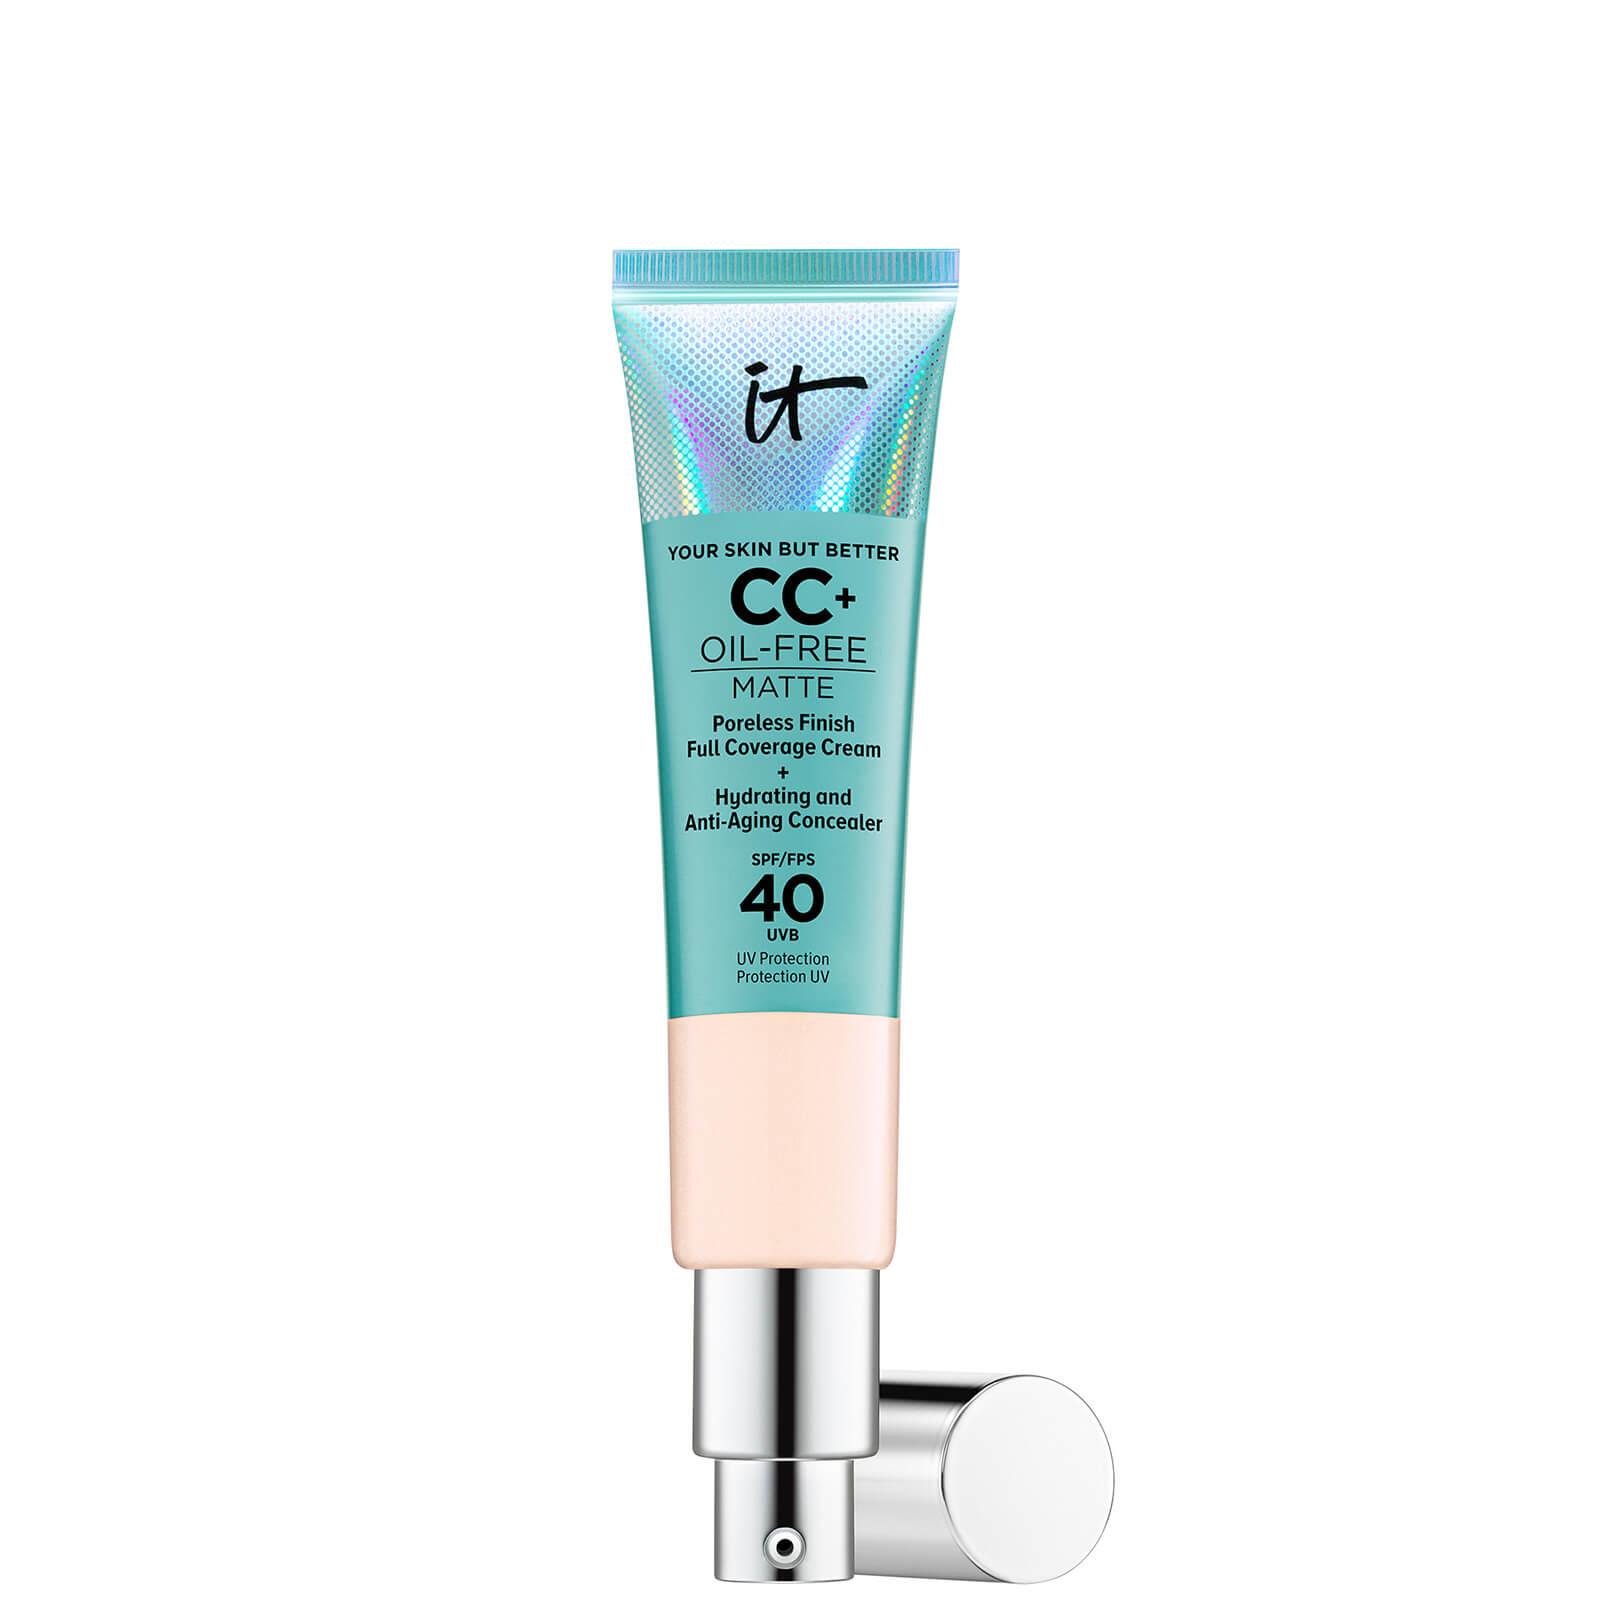 Купить IT Cosmetics Your Skin But Better CC+ Oil-Free Matte SPF40 32ml (Various Shades) - Fair Beige